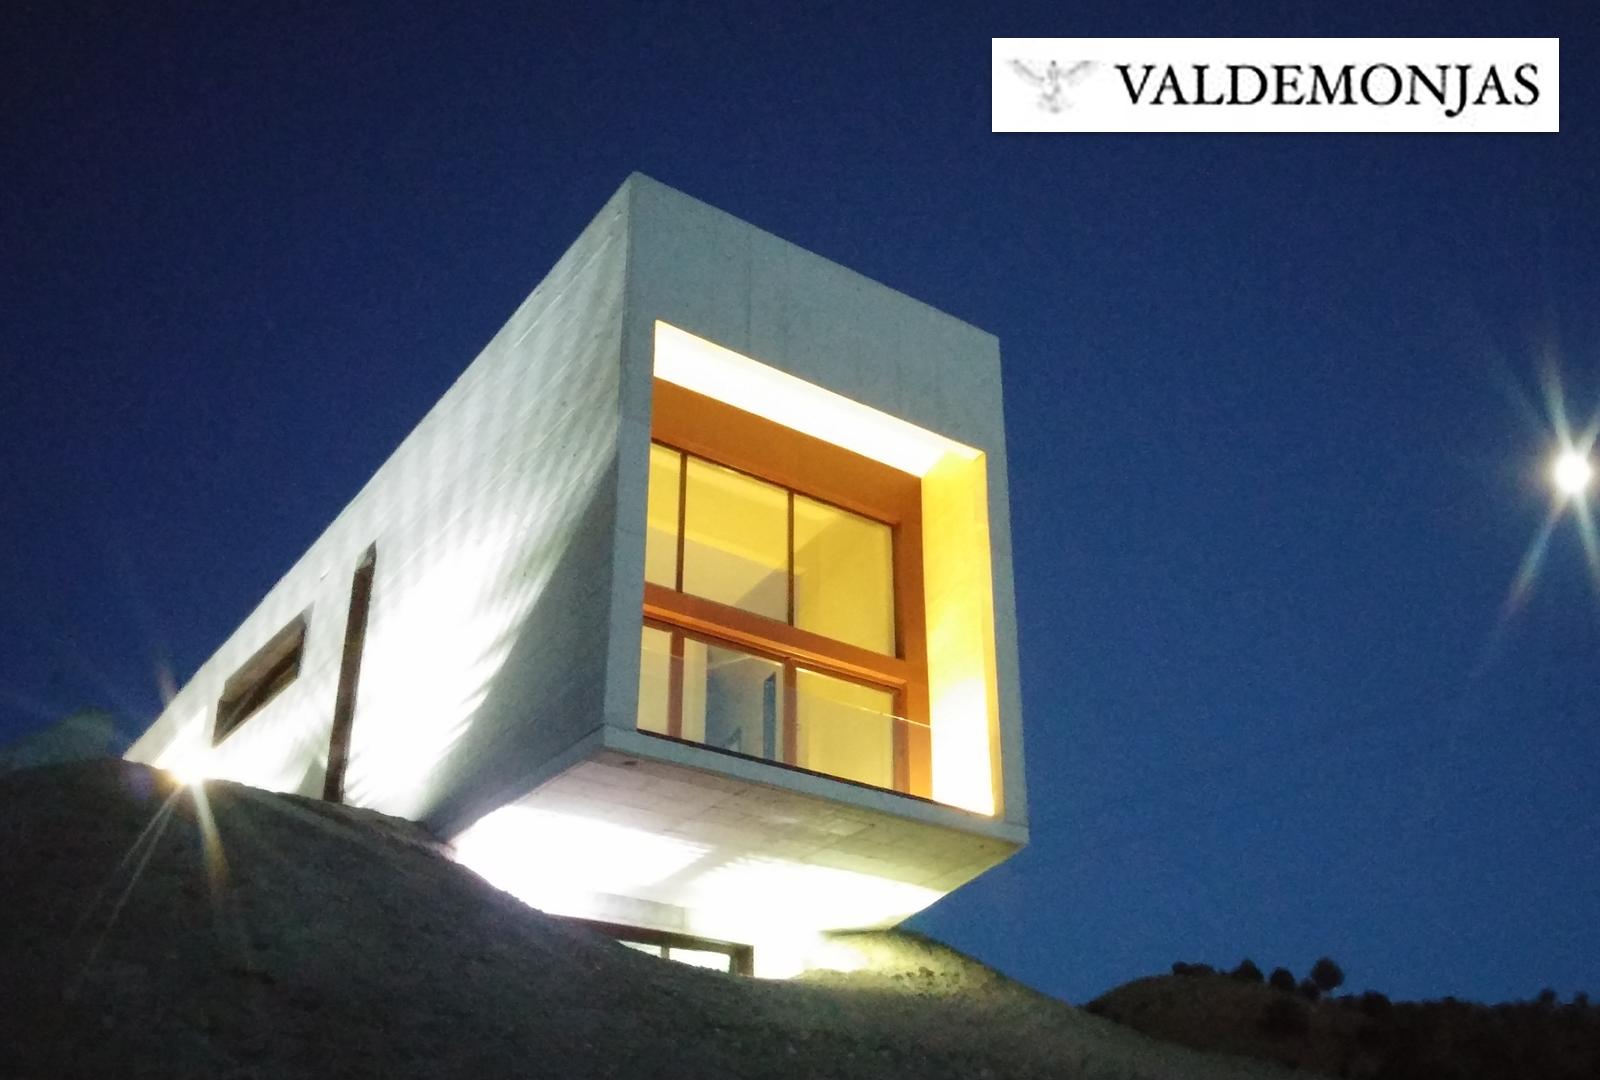 Valdemonjas, finalista premios Architizer A+ de arquitectura.